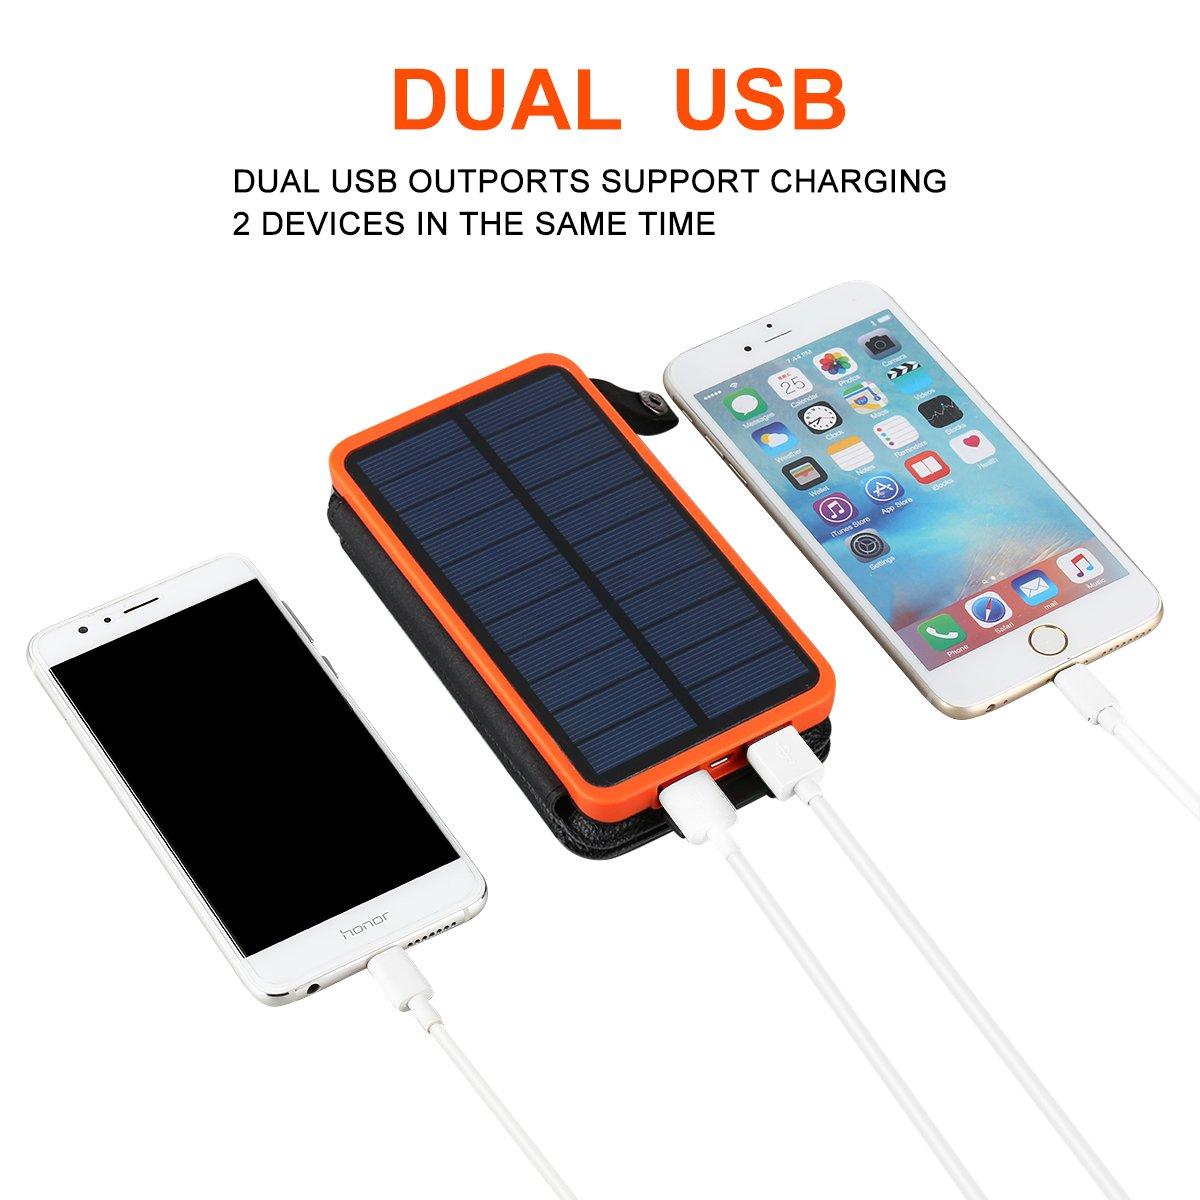 Solar Powerbank 10000mAh Faltbar Outdoor Solar Panel Ladegerät Dual USB Solar Batterie für Handy, iPhone, Samsung Galaxy ipad, Kamera (Orange+3 Panel)